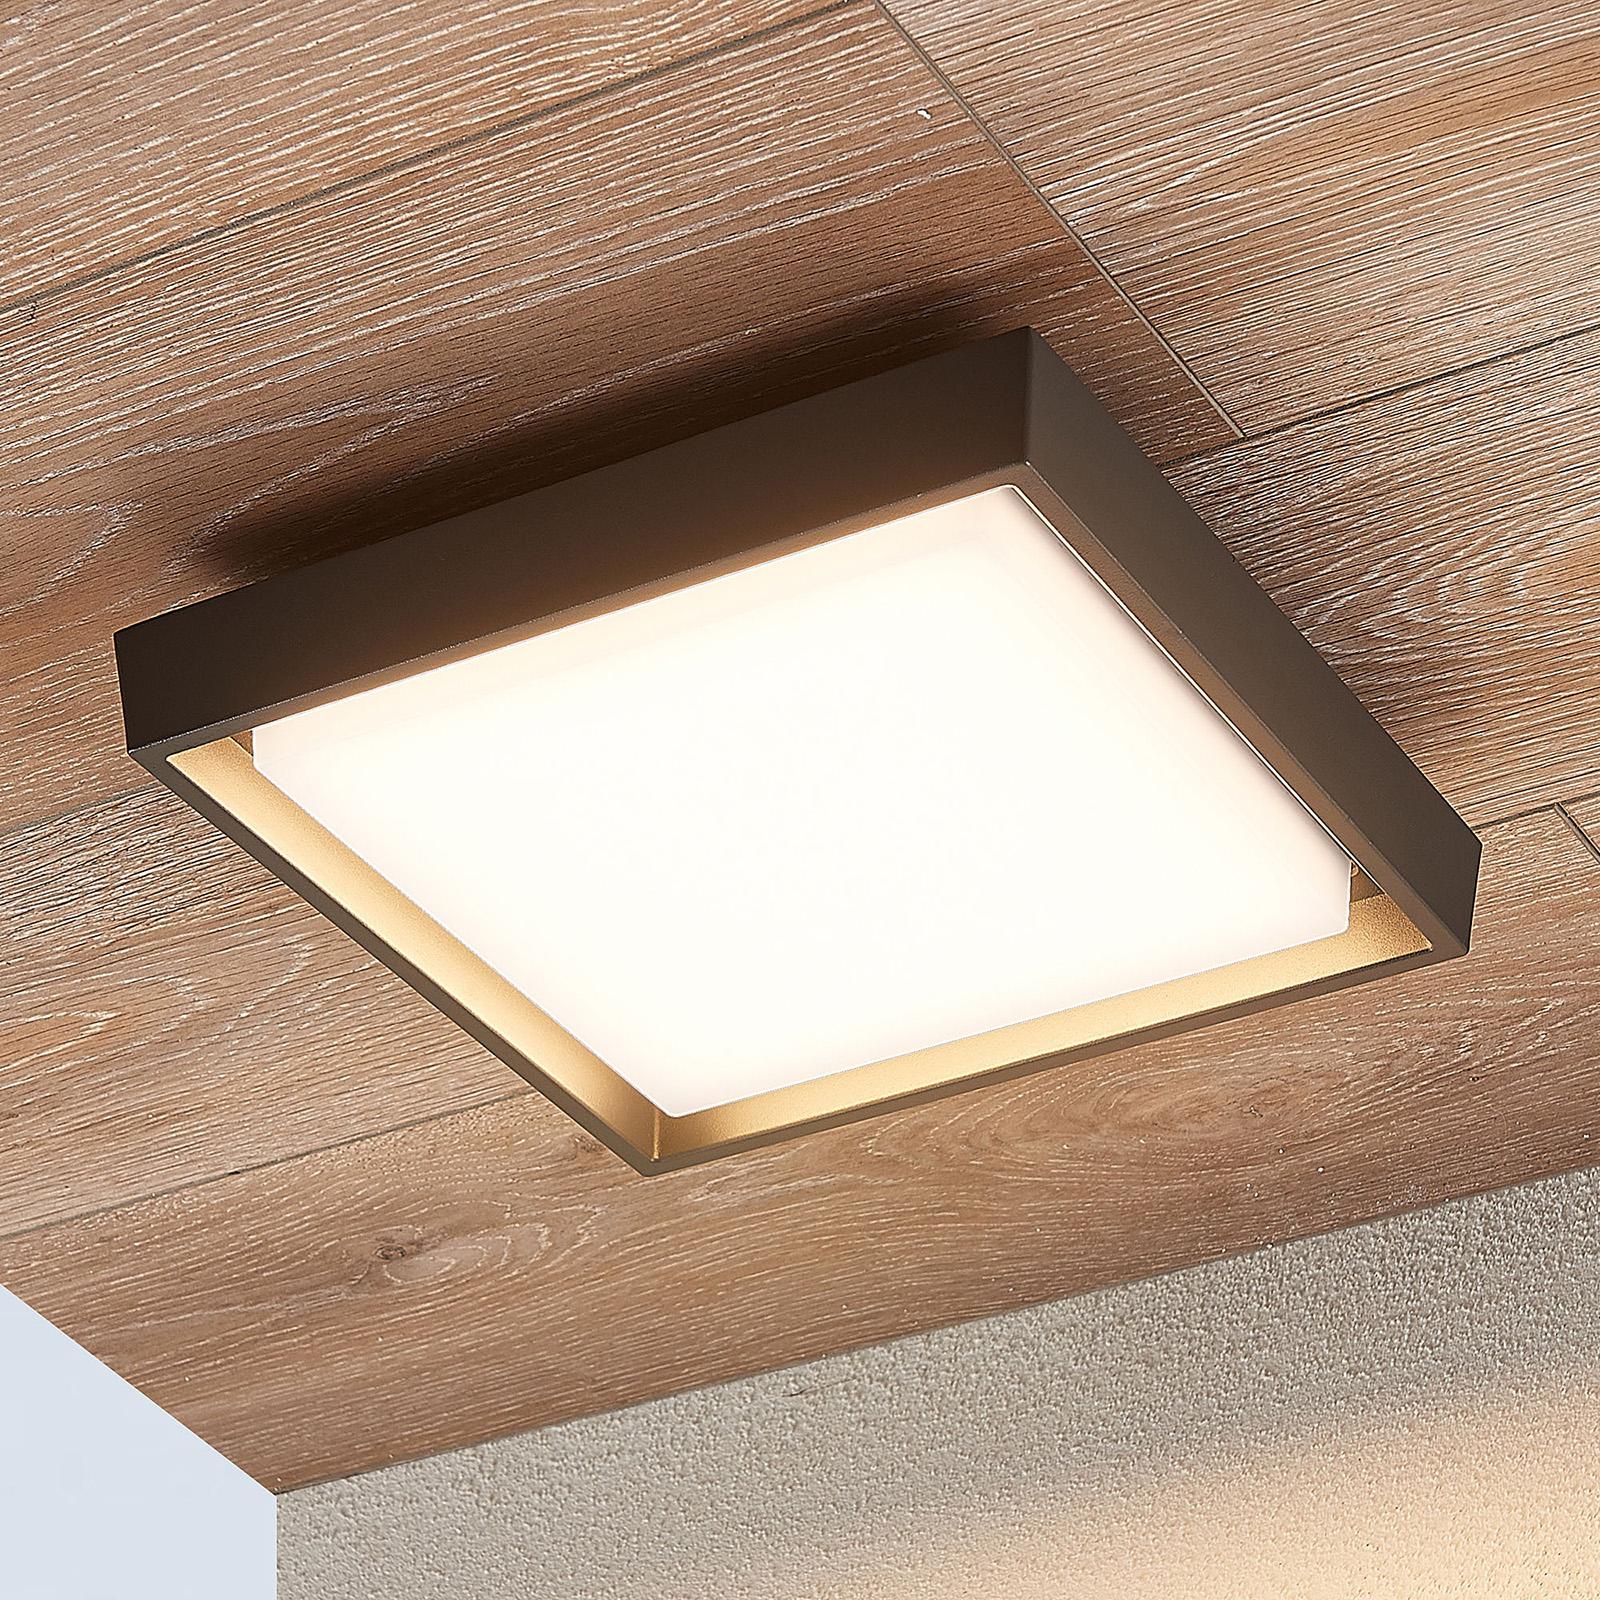 Lampa sufitowa LED Birta, kątowa, 27 cm